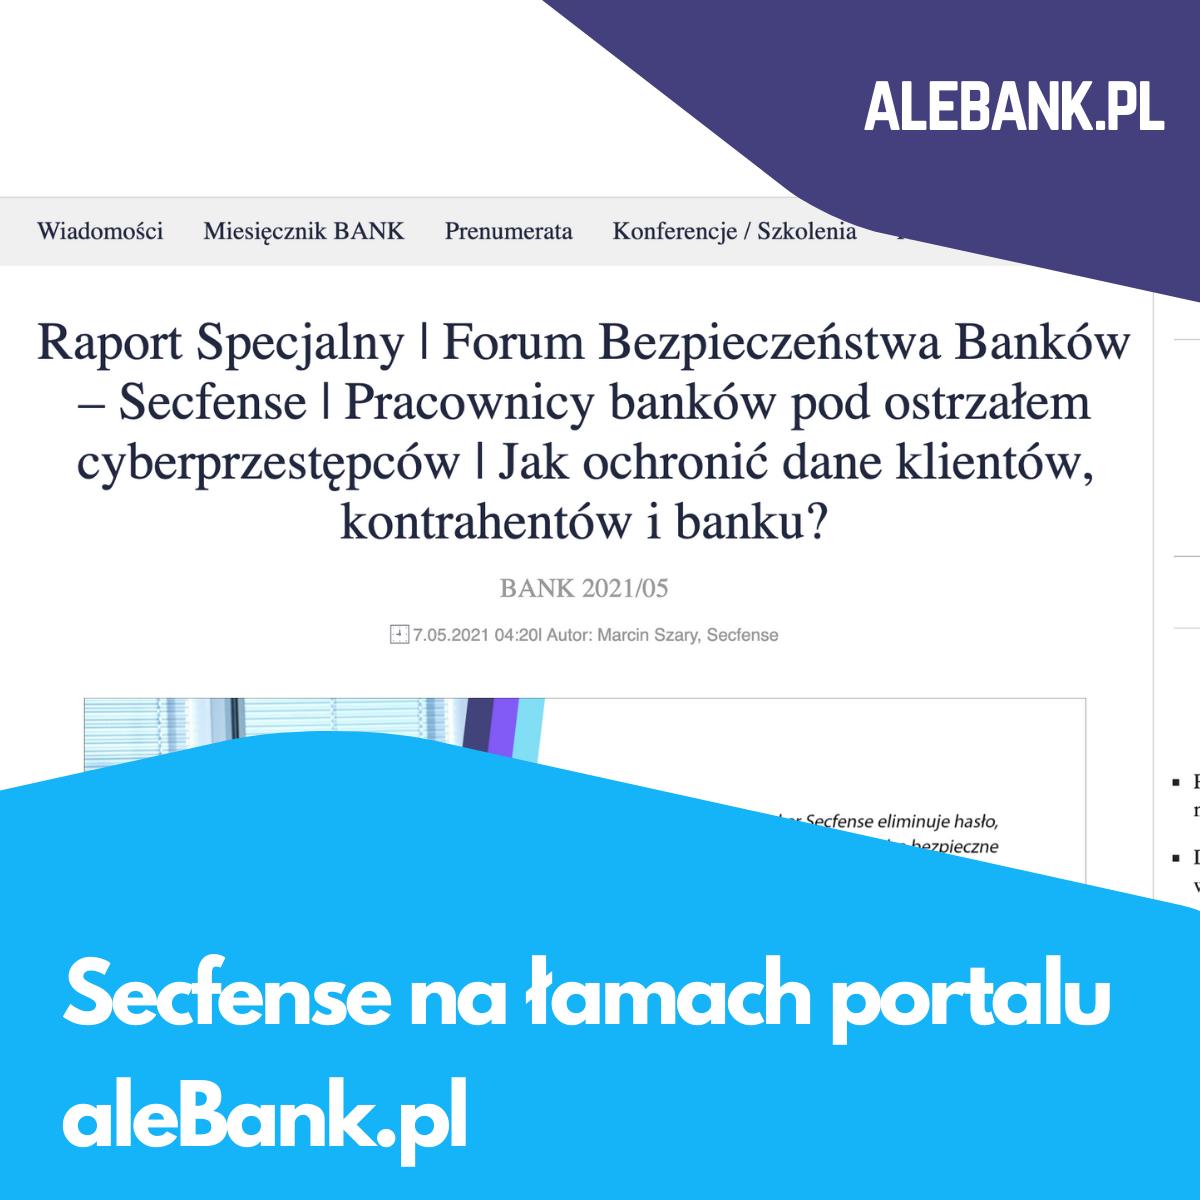 Secfense na łamach portalu aleBank.pl